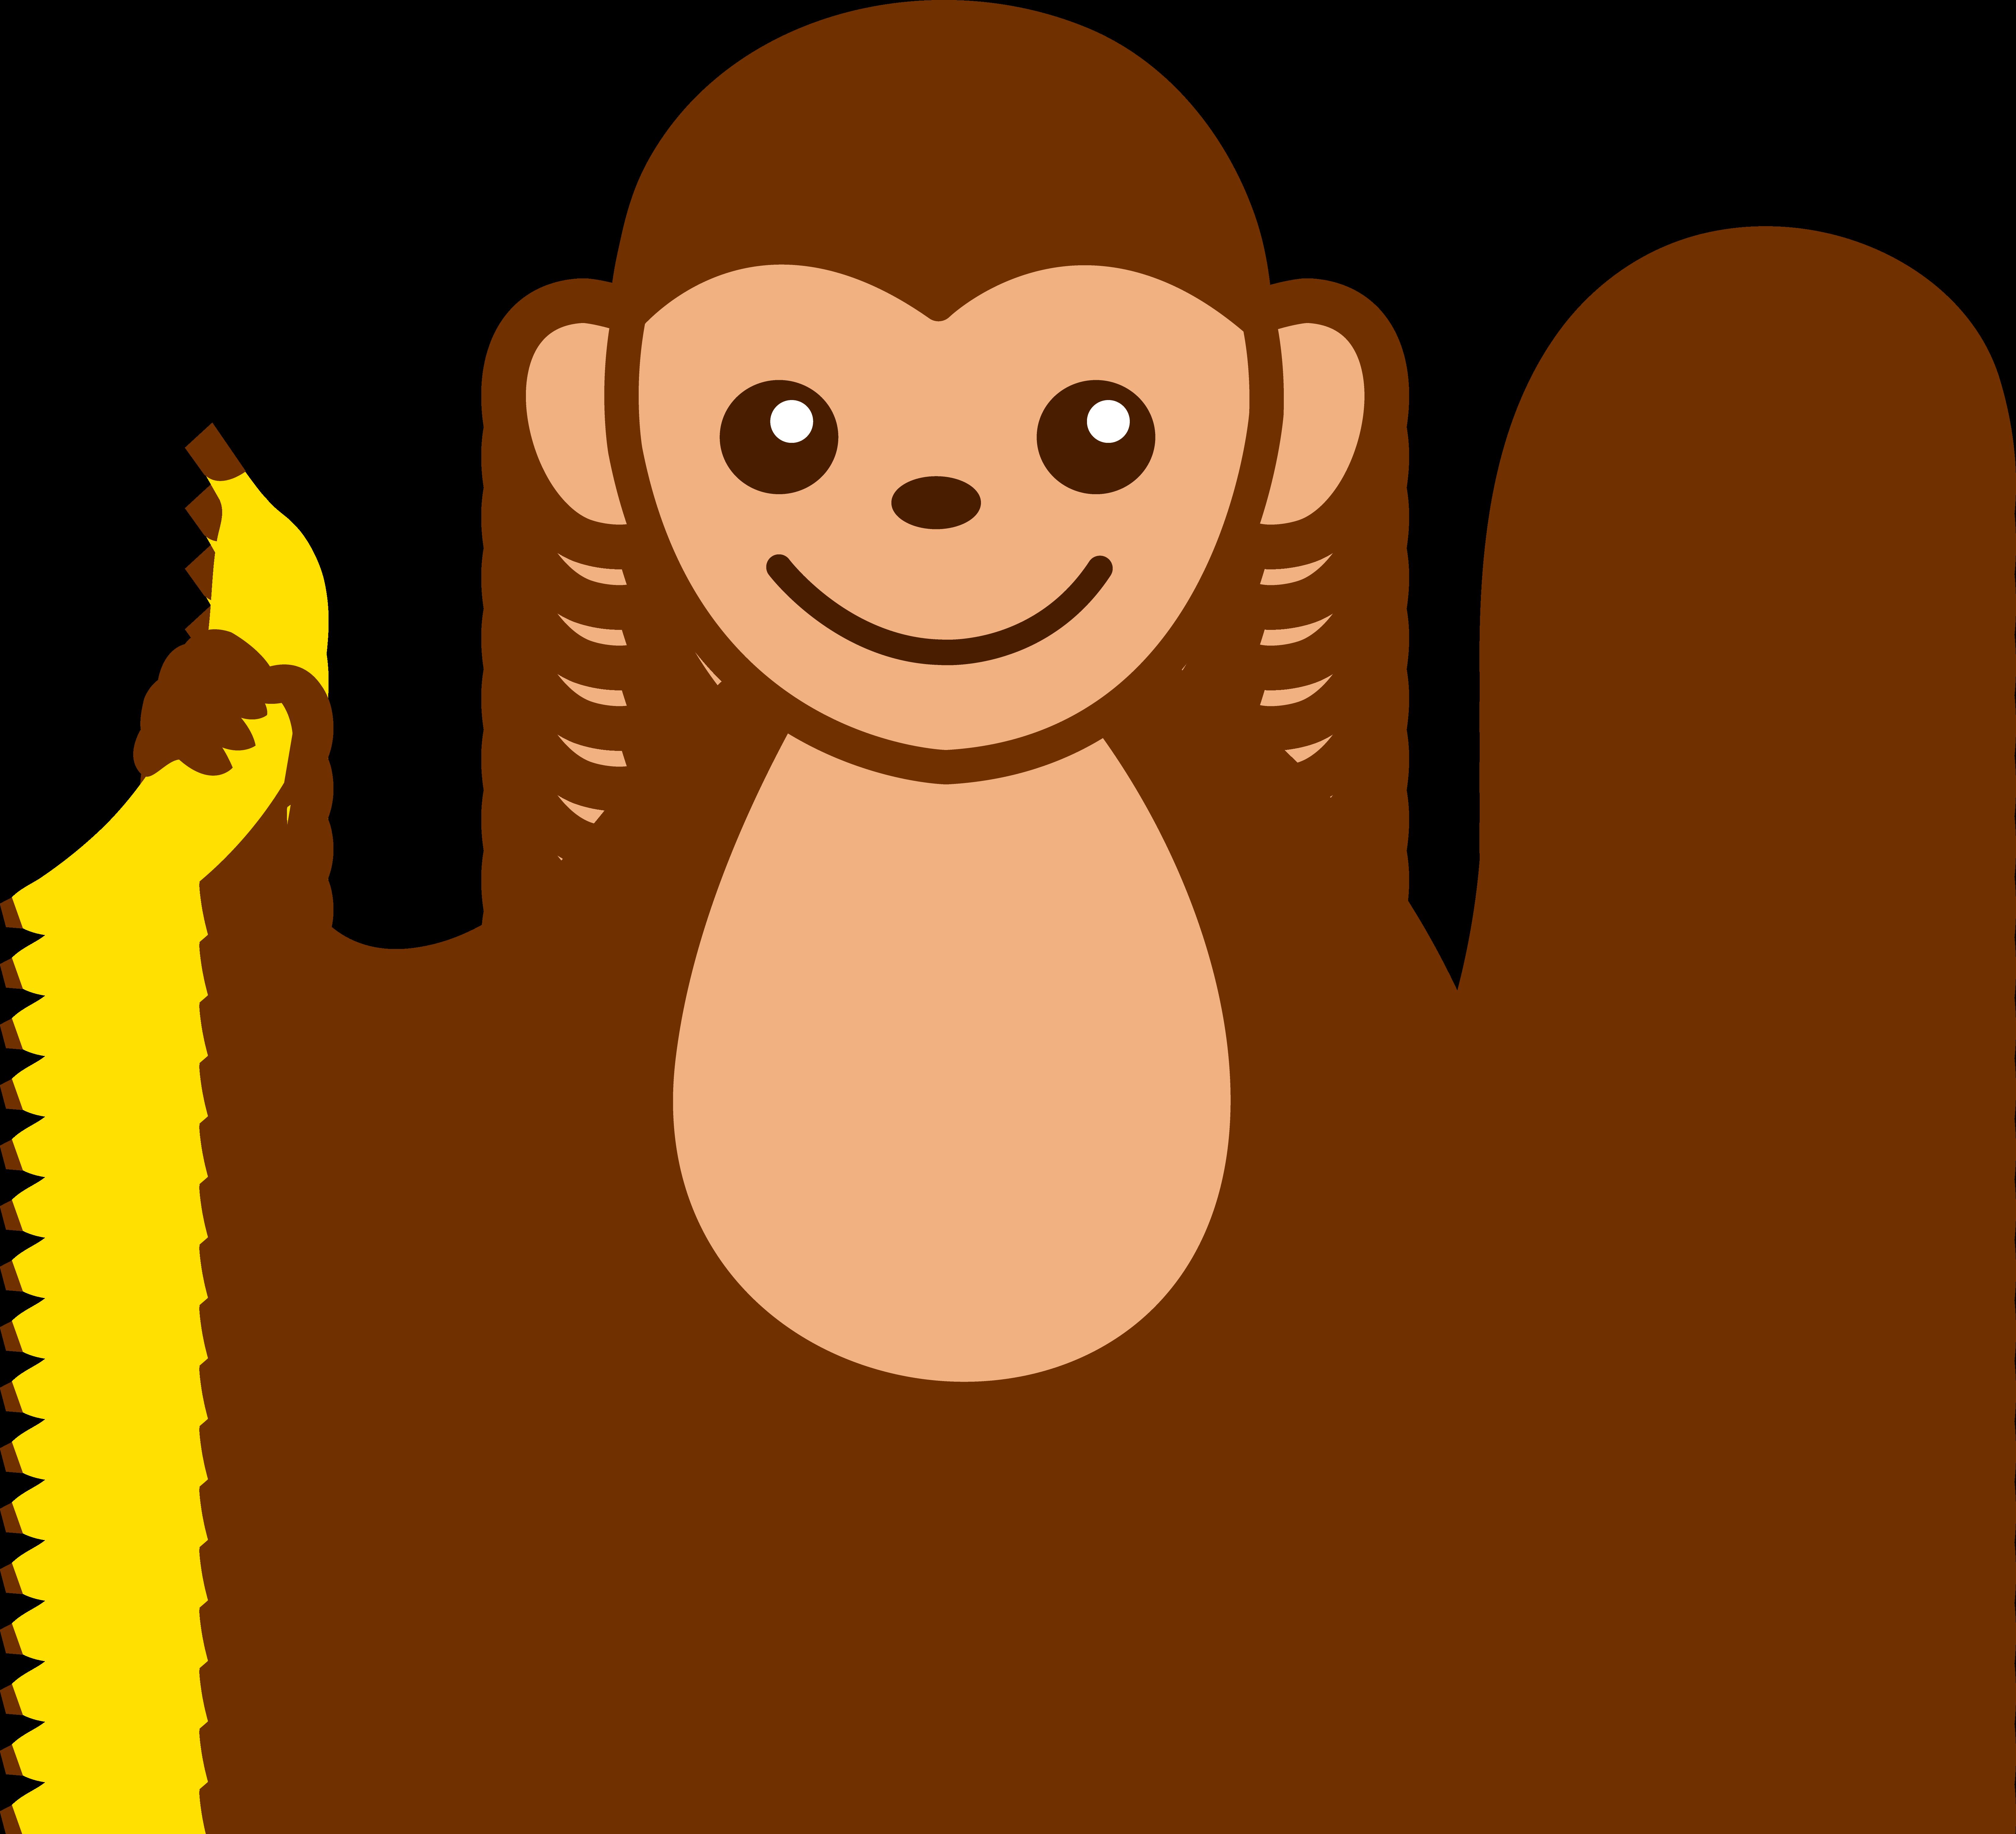 Free ape clipart